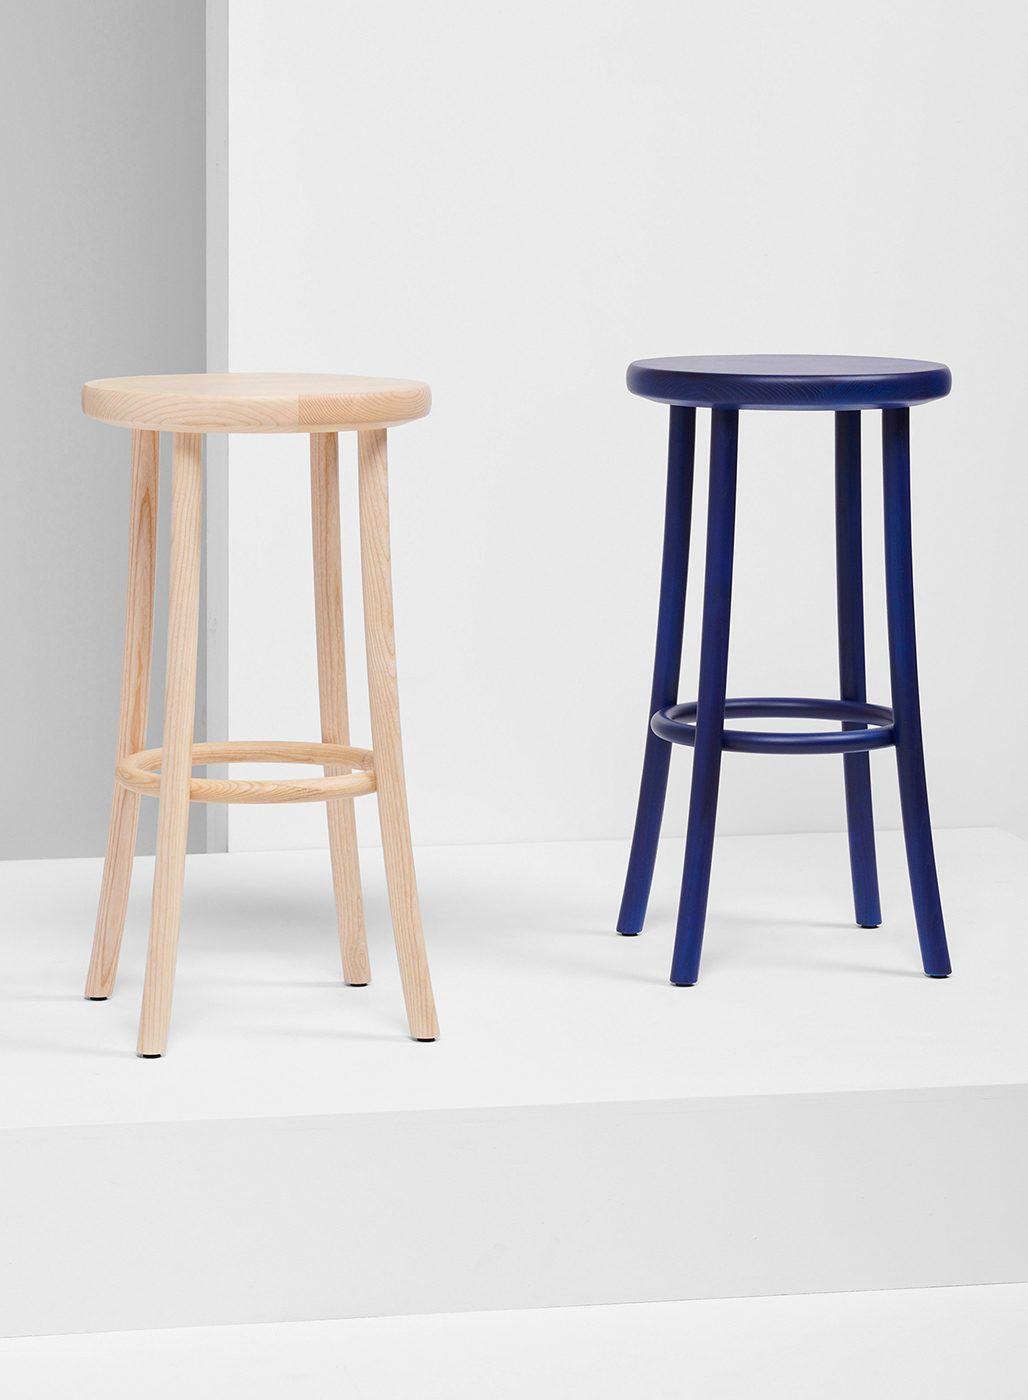 Mc18 Zampa Collection By Jasper Morrison For Mattiazzi Furniture Cute Home Decor Floor Protectors For Chairs